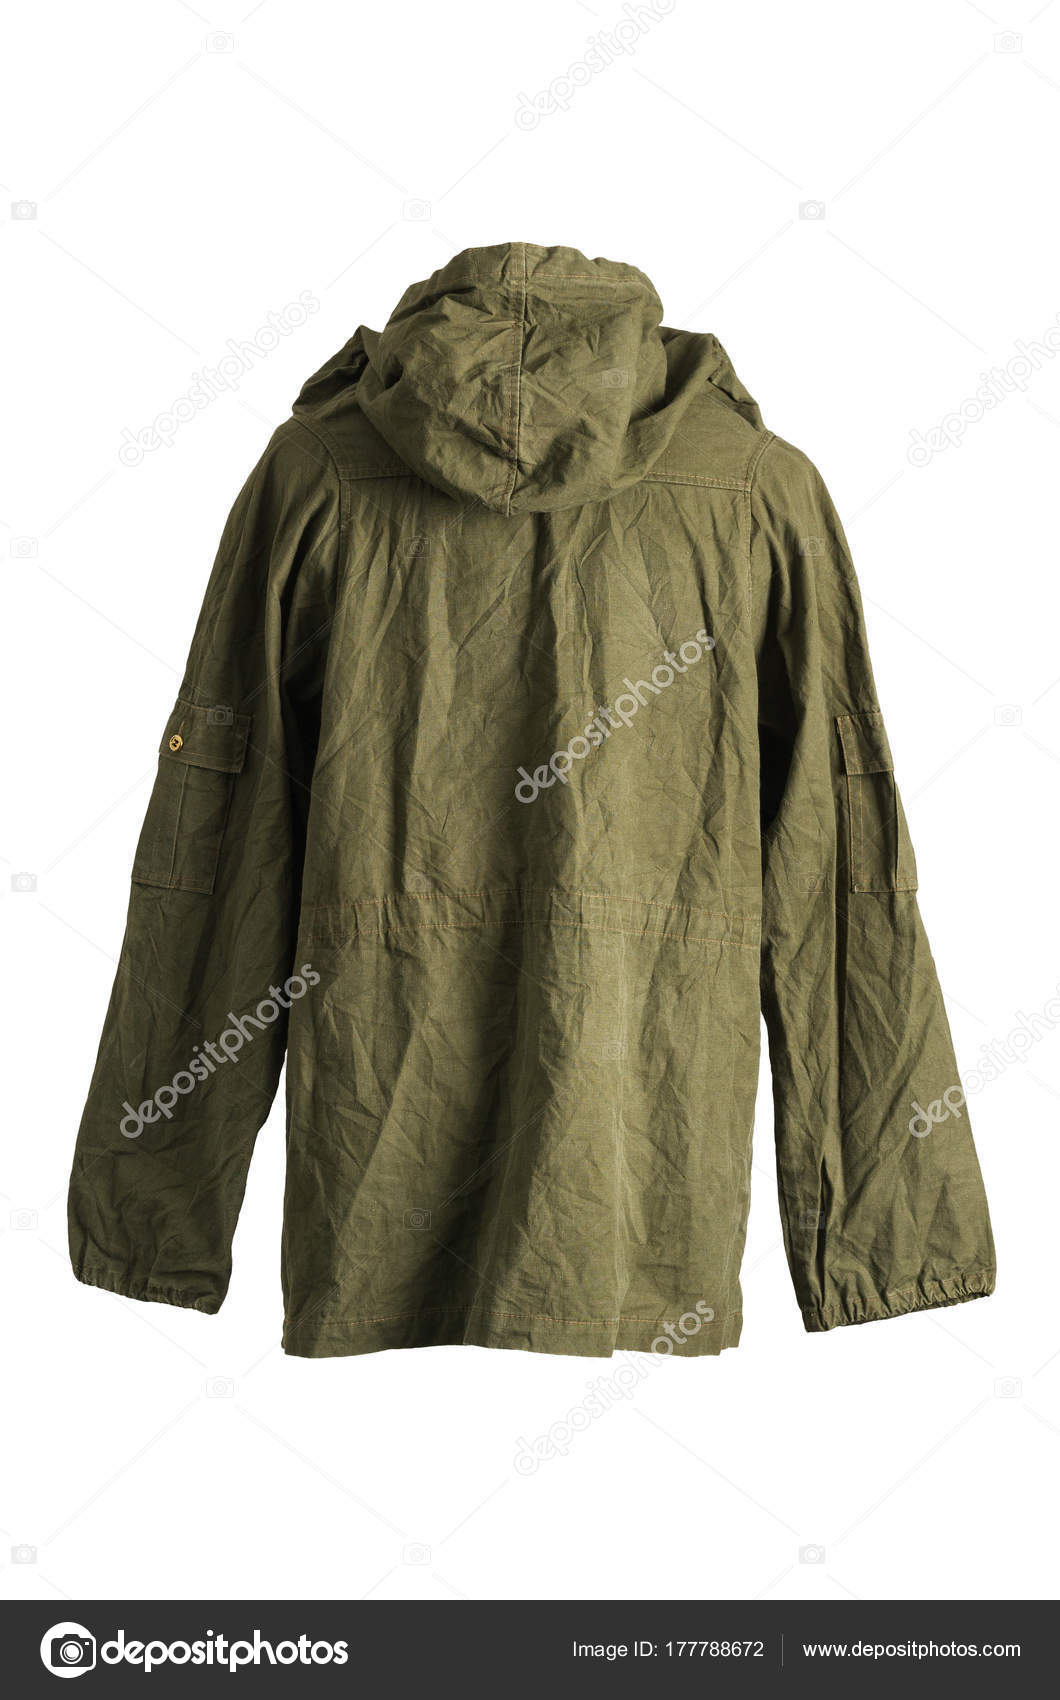 619cccab6e3 depositphotos_177788672-stockafbeelding-groene-leger-smock-parka-jas.jpg